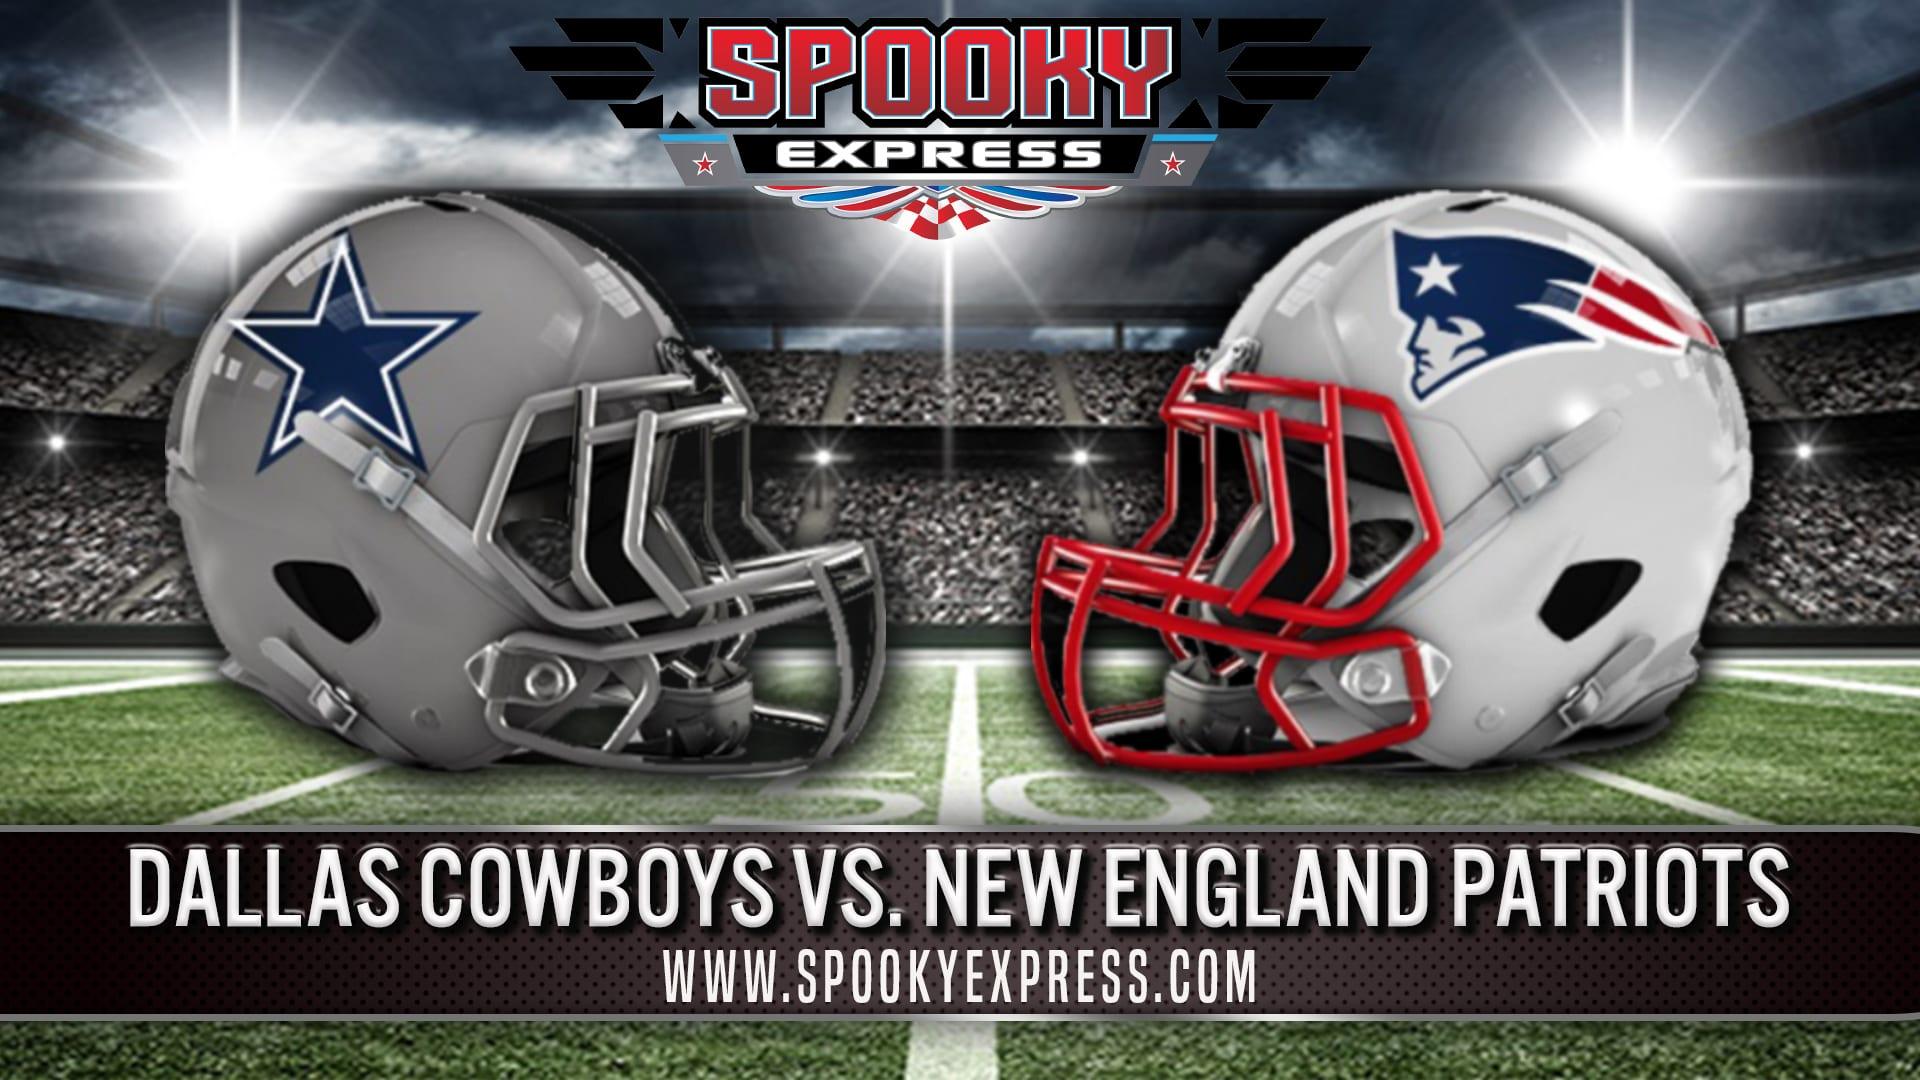 Nfl Betting Preview Dallas Cowboys Vs New England Patriots